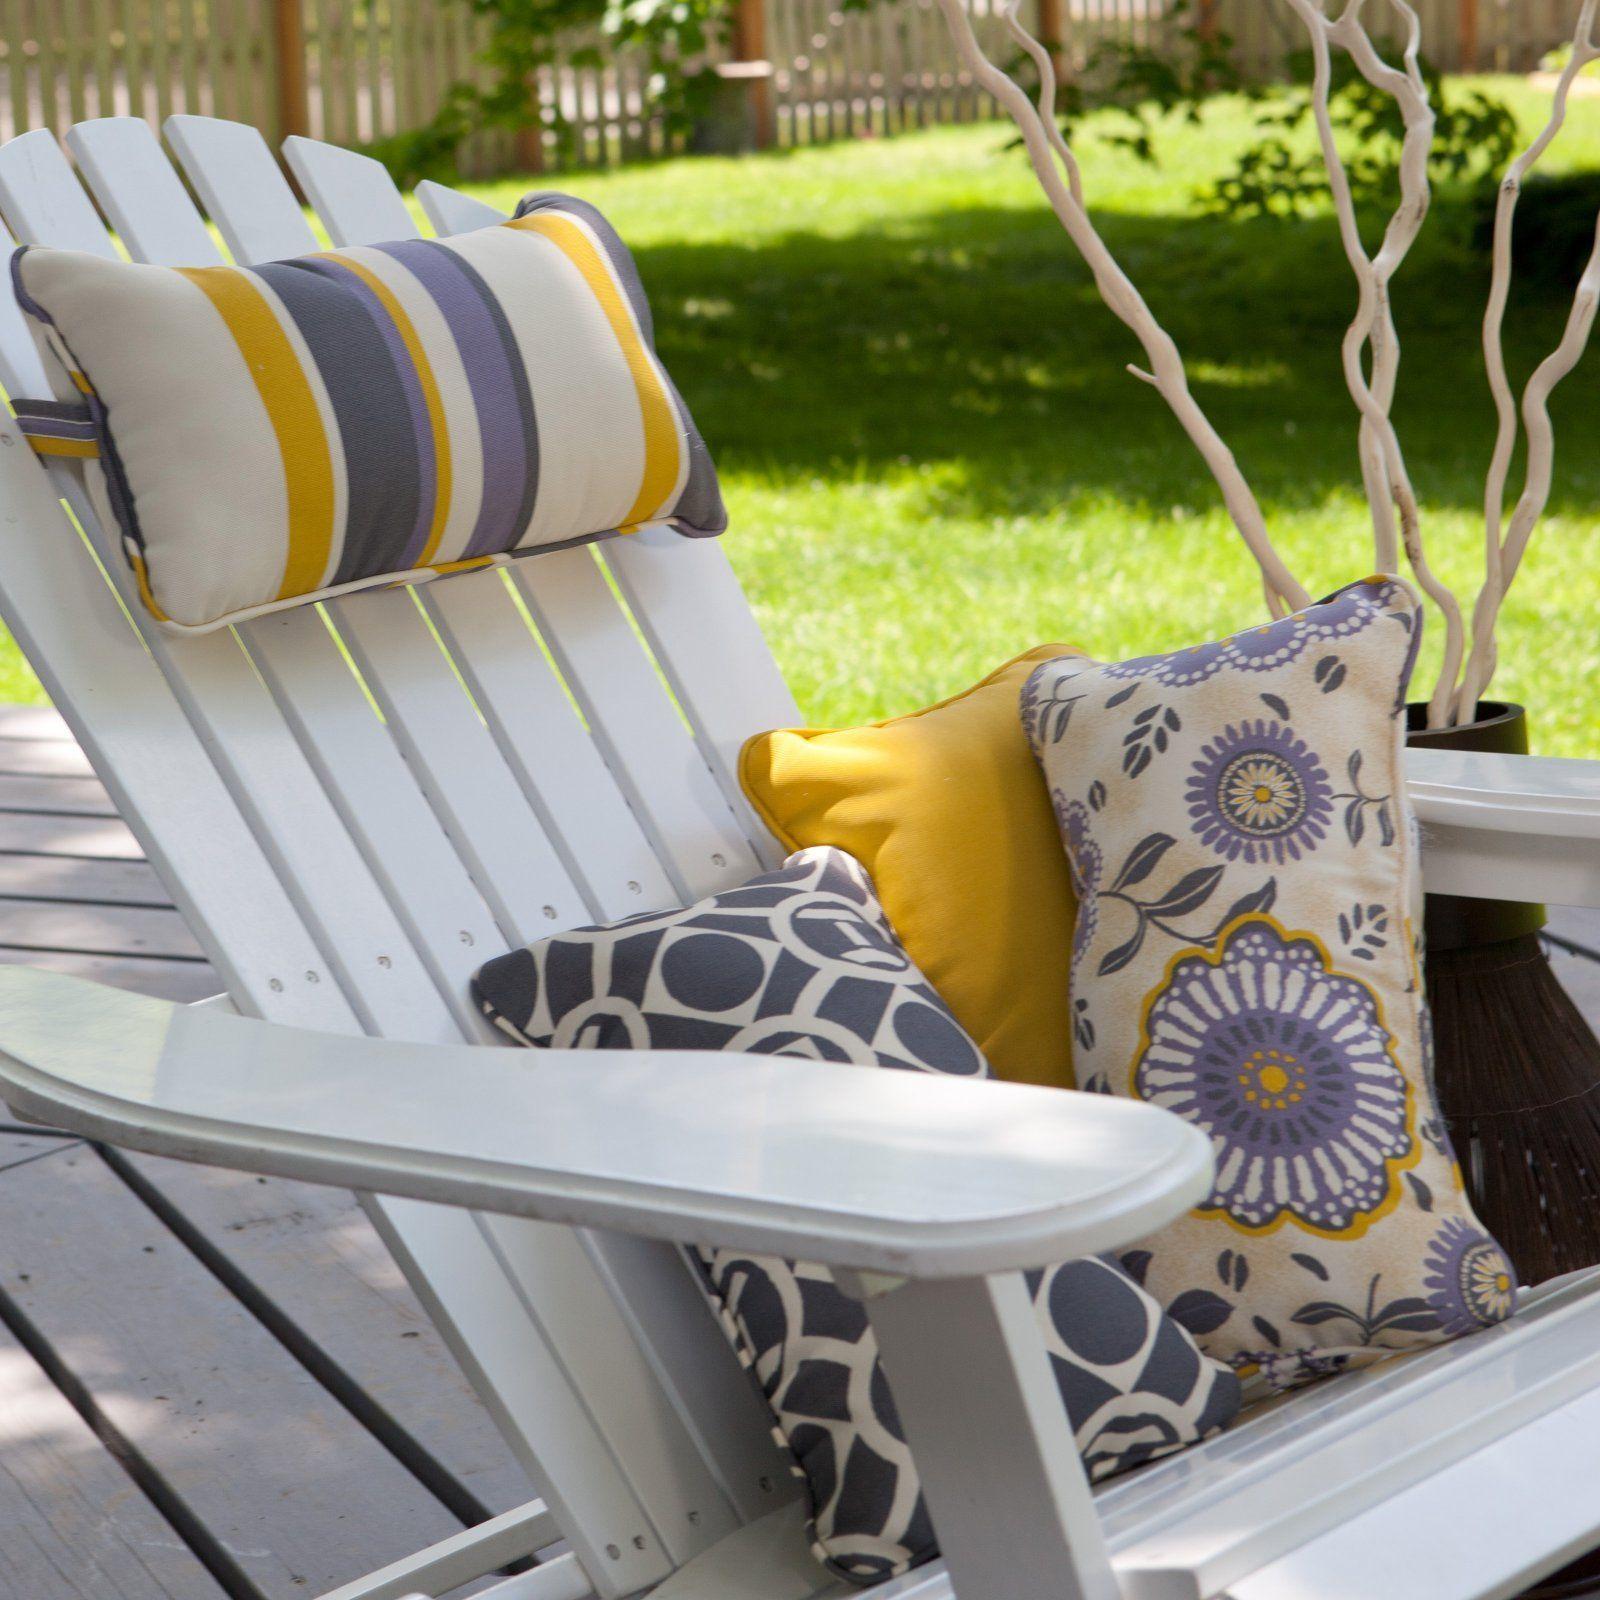 Adirondack Chair Headrest Pillow AdirondackChair Adirondack